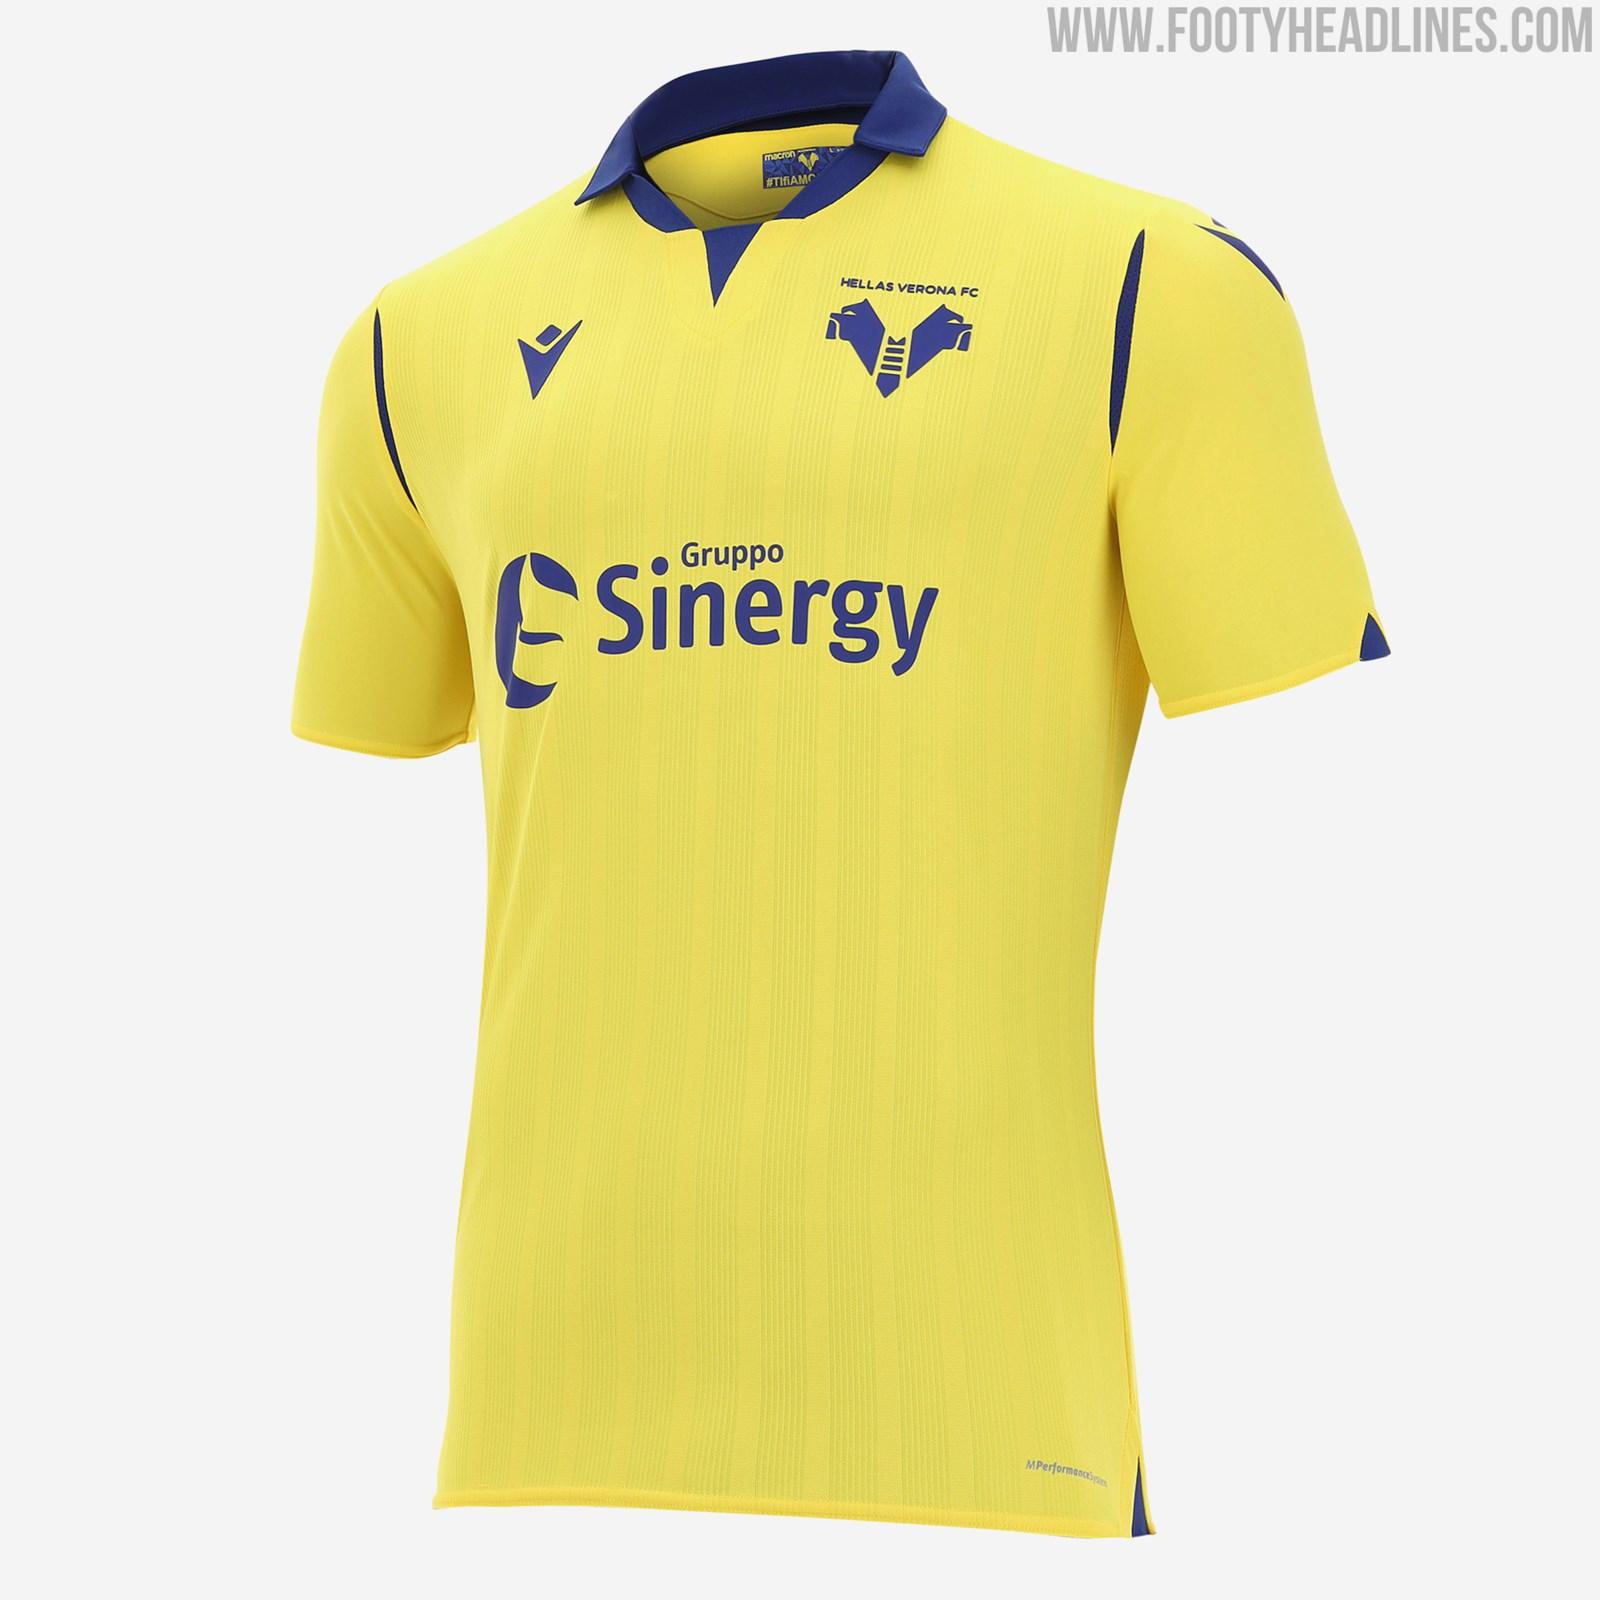 6, 22, 17 bright green: All-New Logo: Hellas Verona 20-21 Home & Away Kits